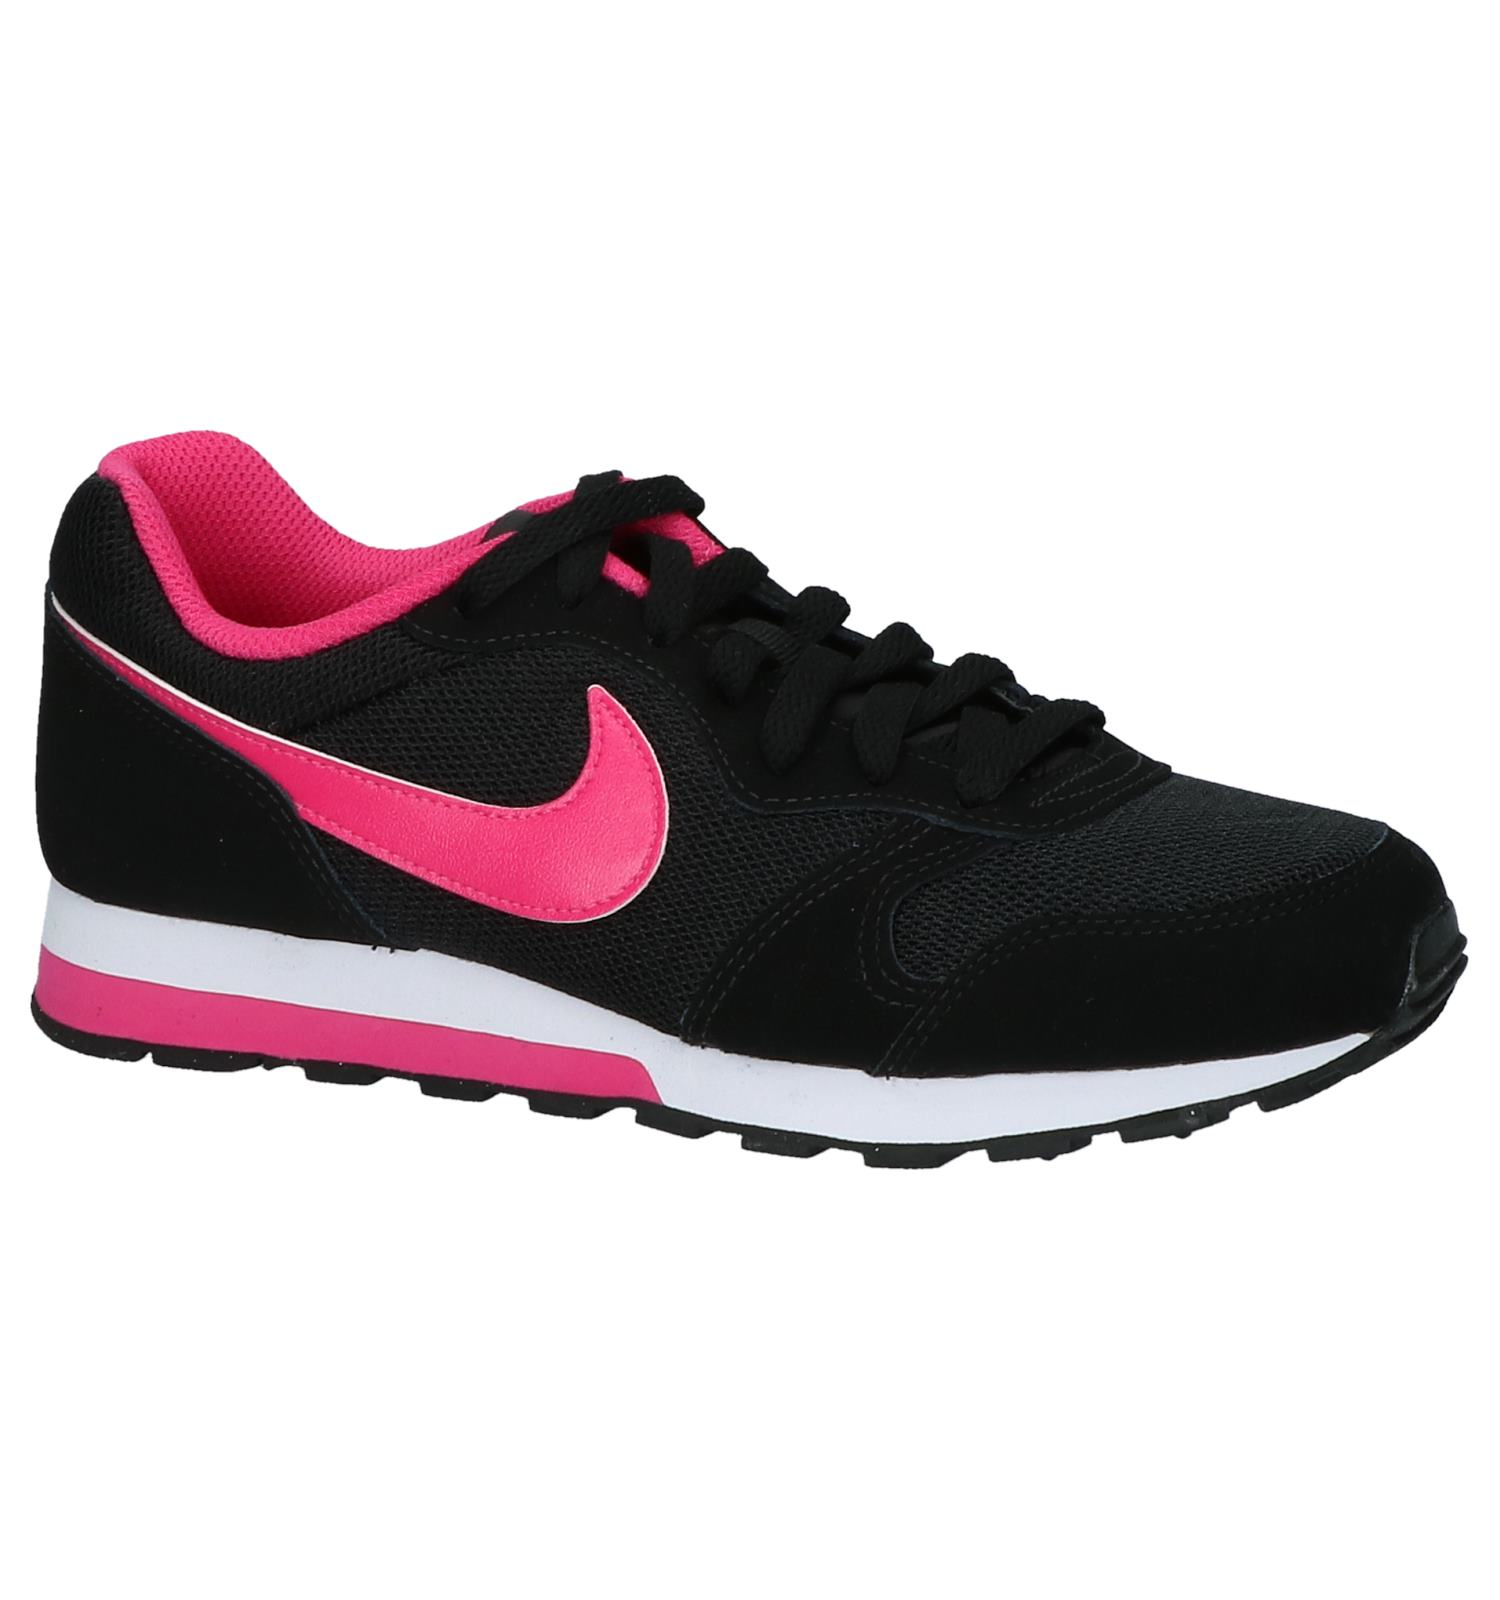 c9990ab2861 Zwart/Roze Sneakers Nike MD Runner 2 | TORFS.BE | Gratis verzend en retour